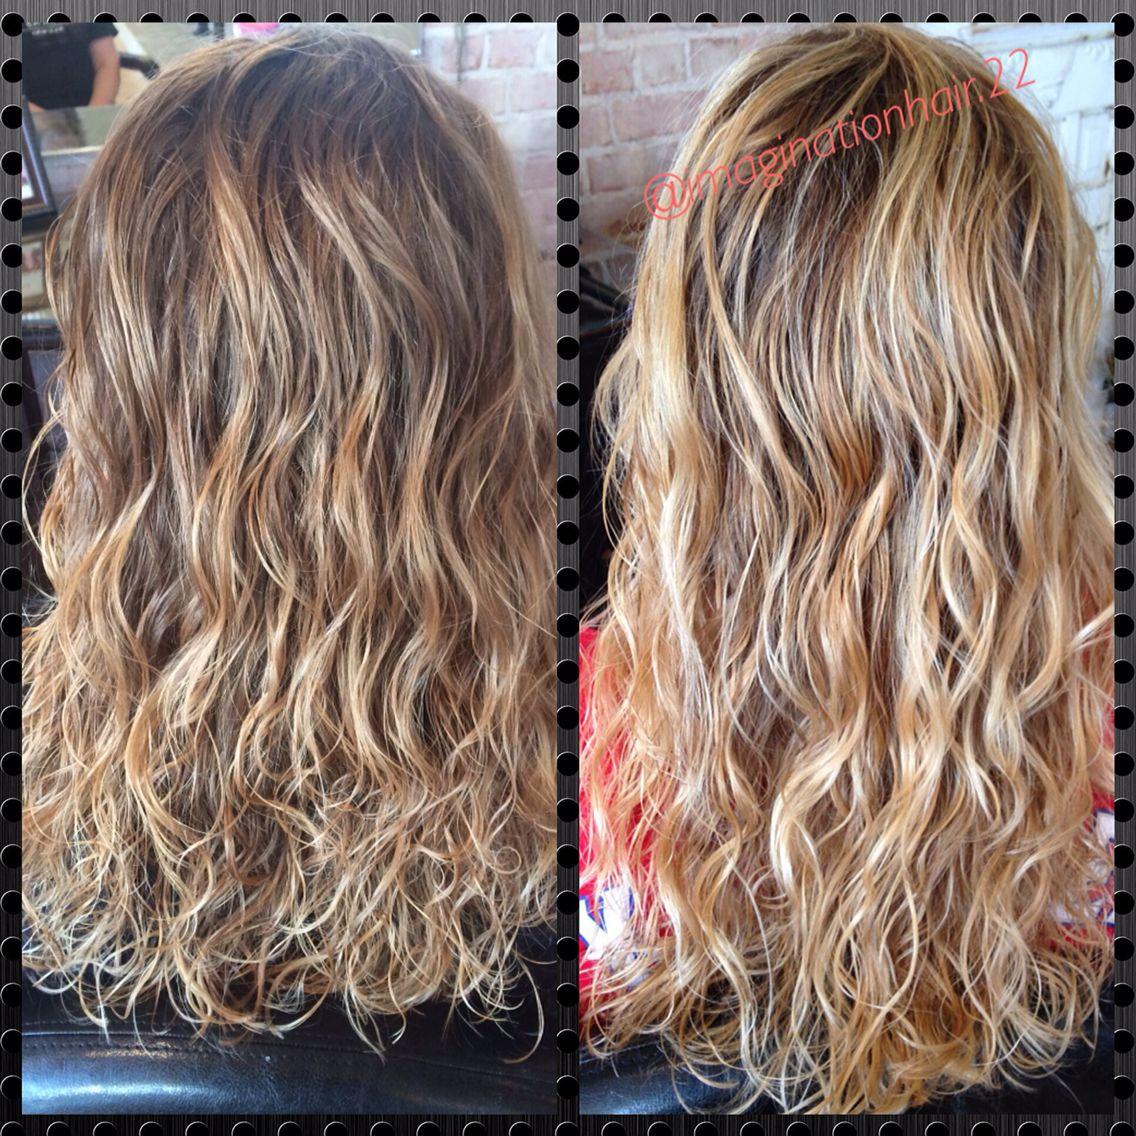 Blonde Balayage On Naturally Curly Hair Blonde Balayage Balayage Hair Blonde Short Balayage Hair Honey